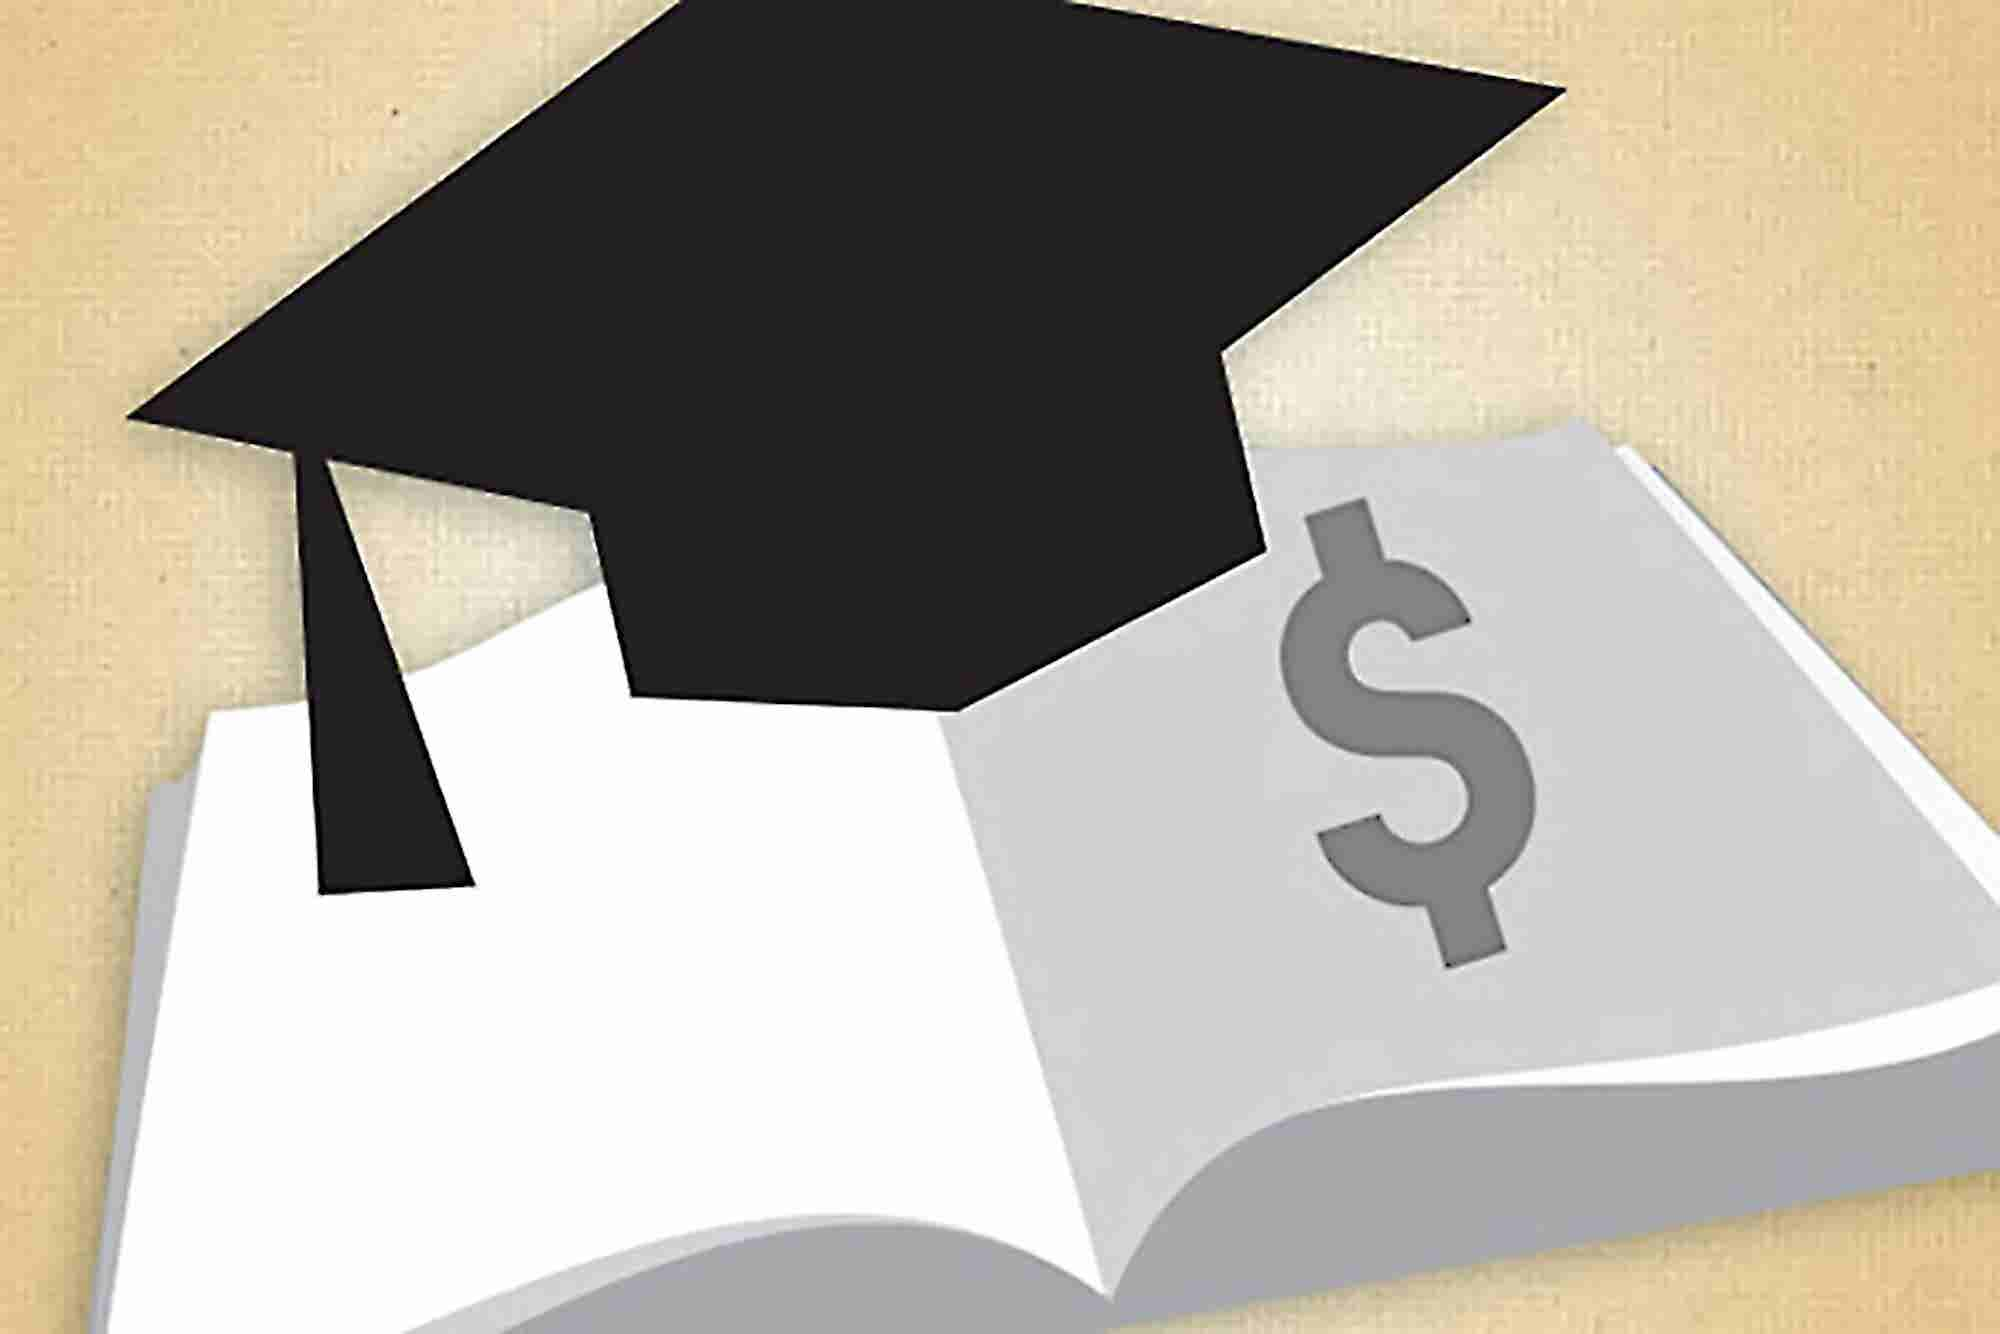 6 Ways to Land Start-Up Funding on Campus